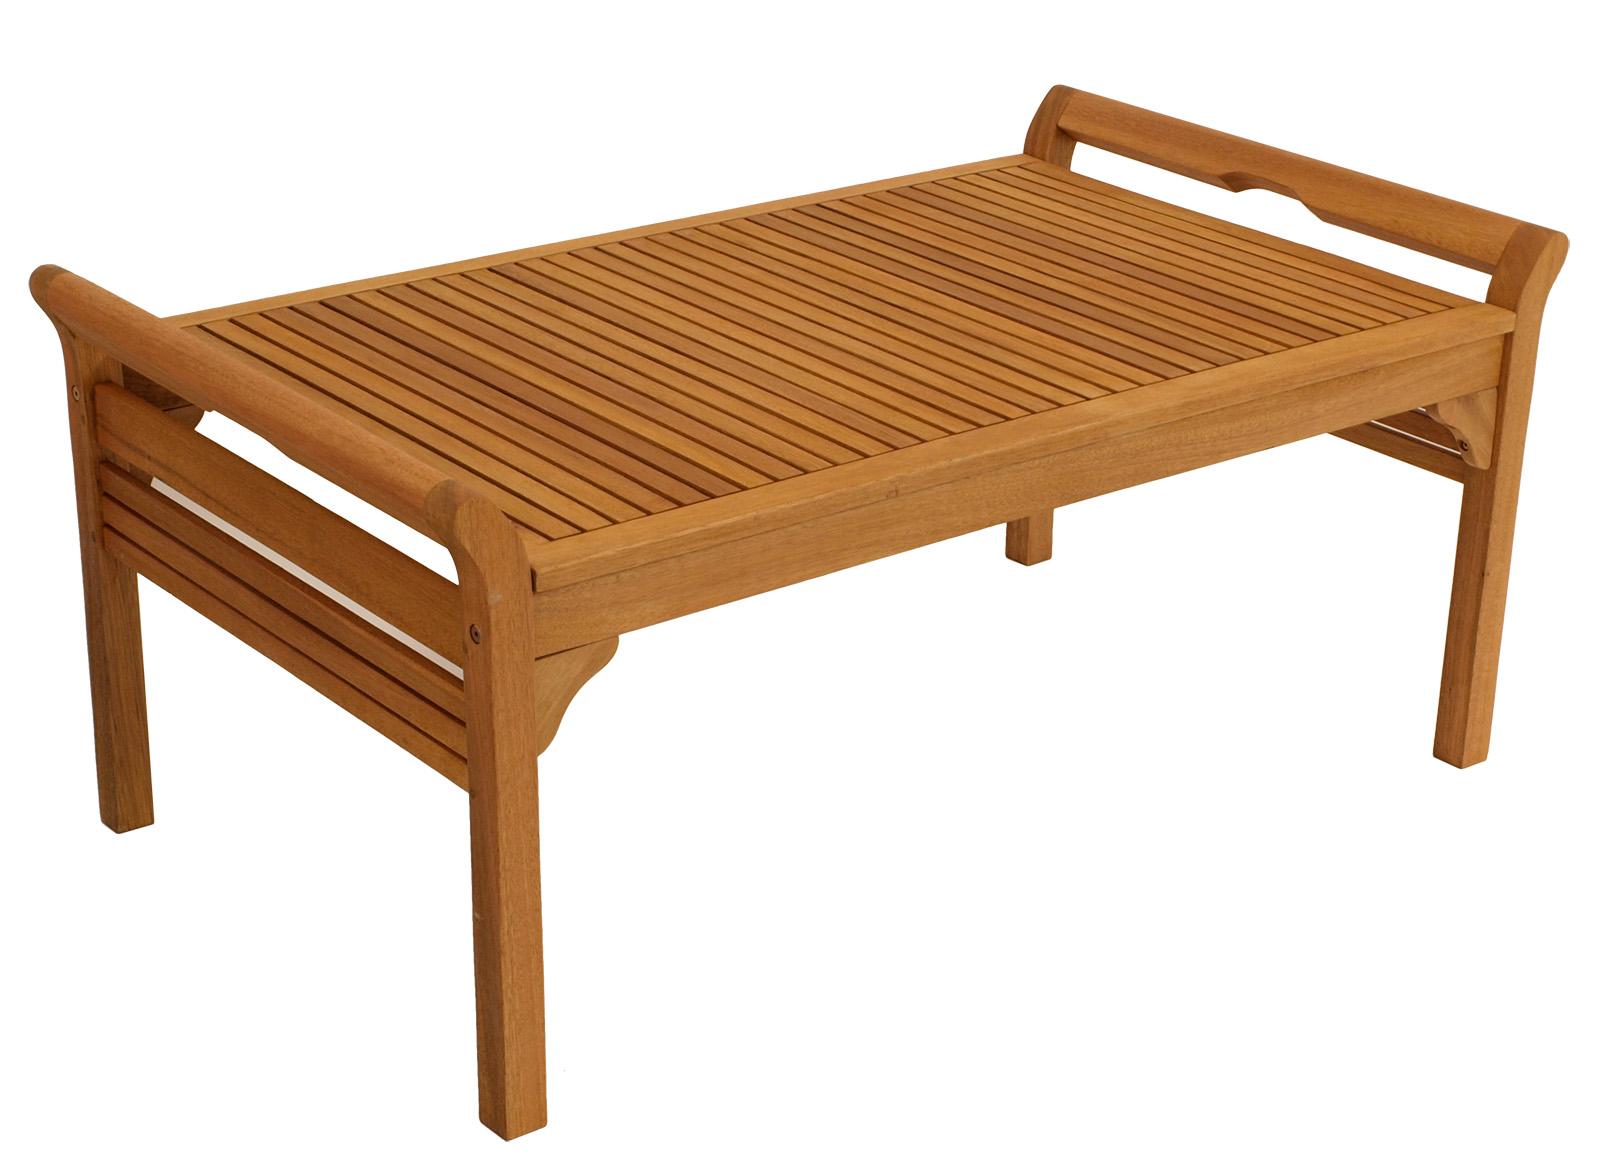 Lounge Set MALAGA 4-tlg. Eukalyptus geölt, mit Polstern creme, FSC®-zertifiziert